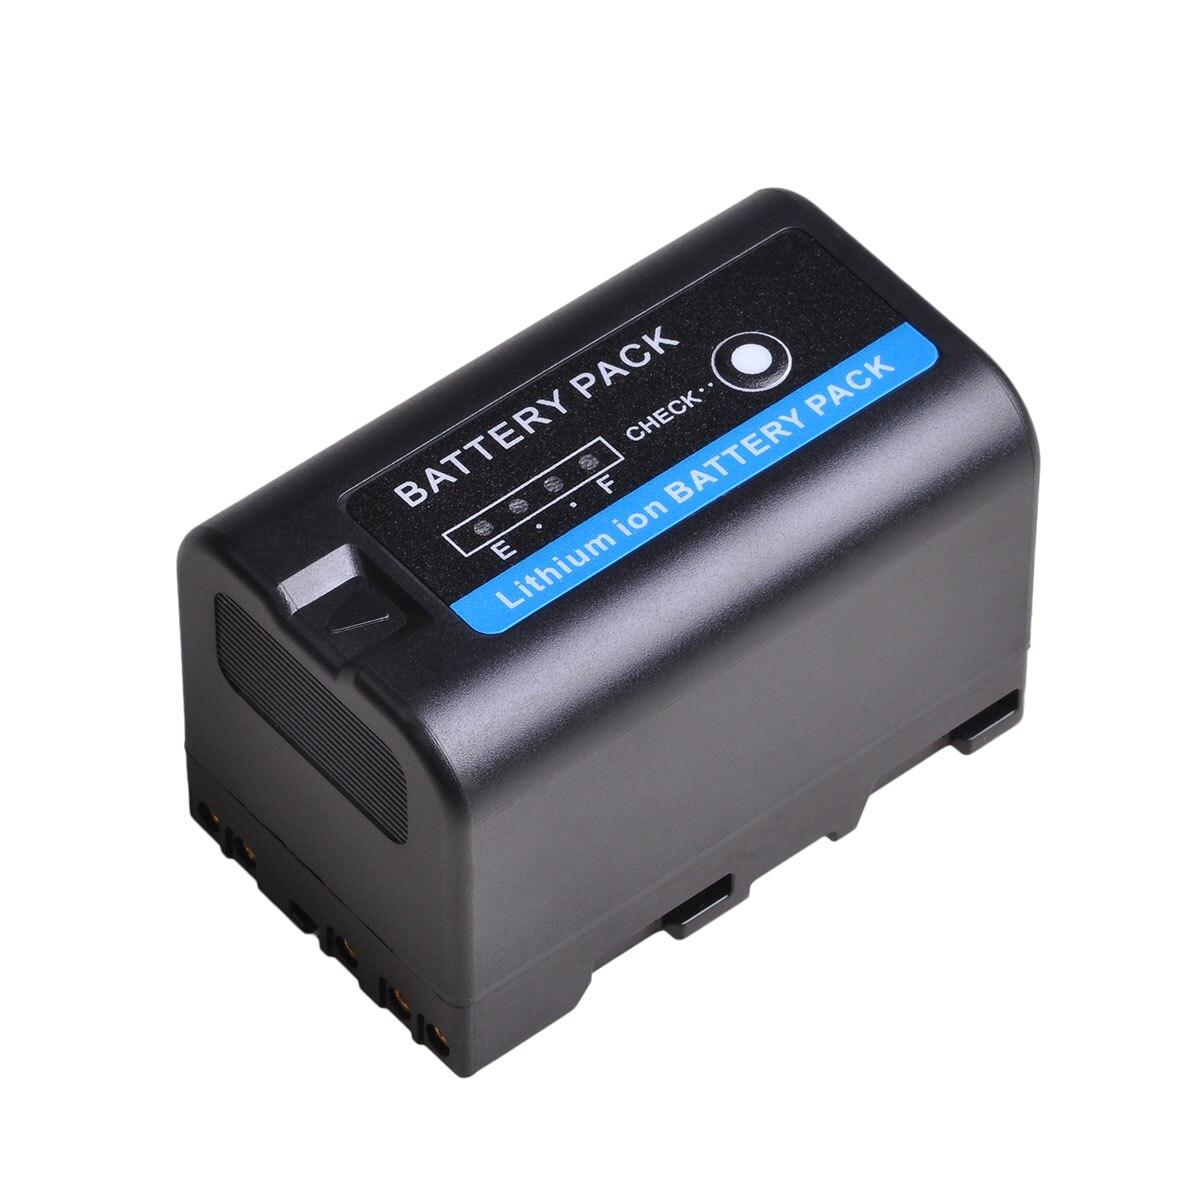 2800mAh BP-U30 Batterie für Sony BP U30 U60 U90 PMW-100 PMW-150 PMW-200 PMW-300 PMW EX1 EX3 F3 F3K